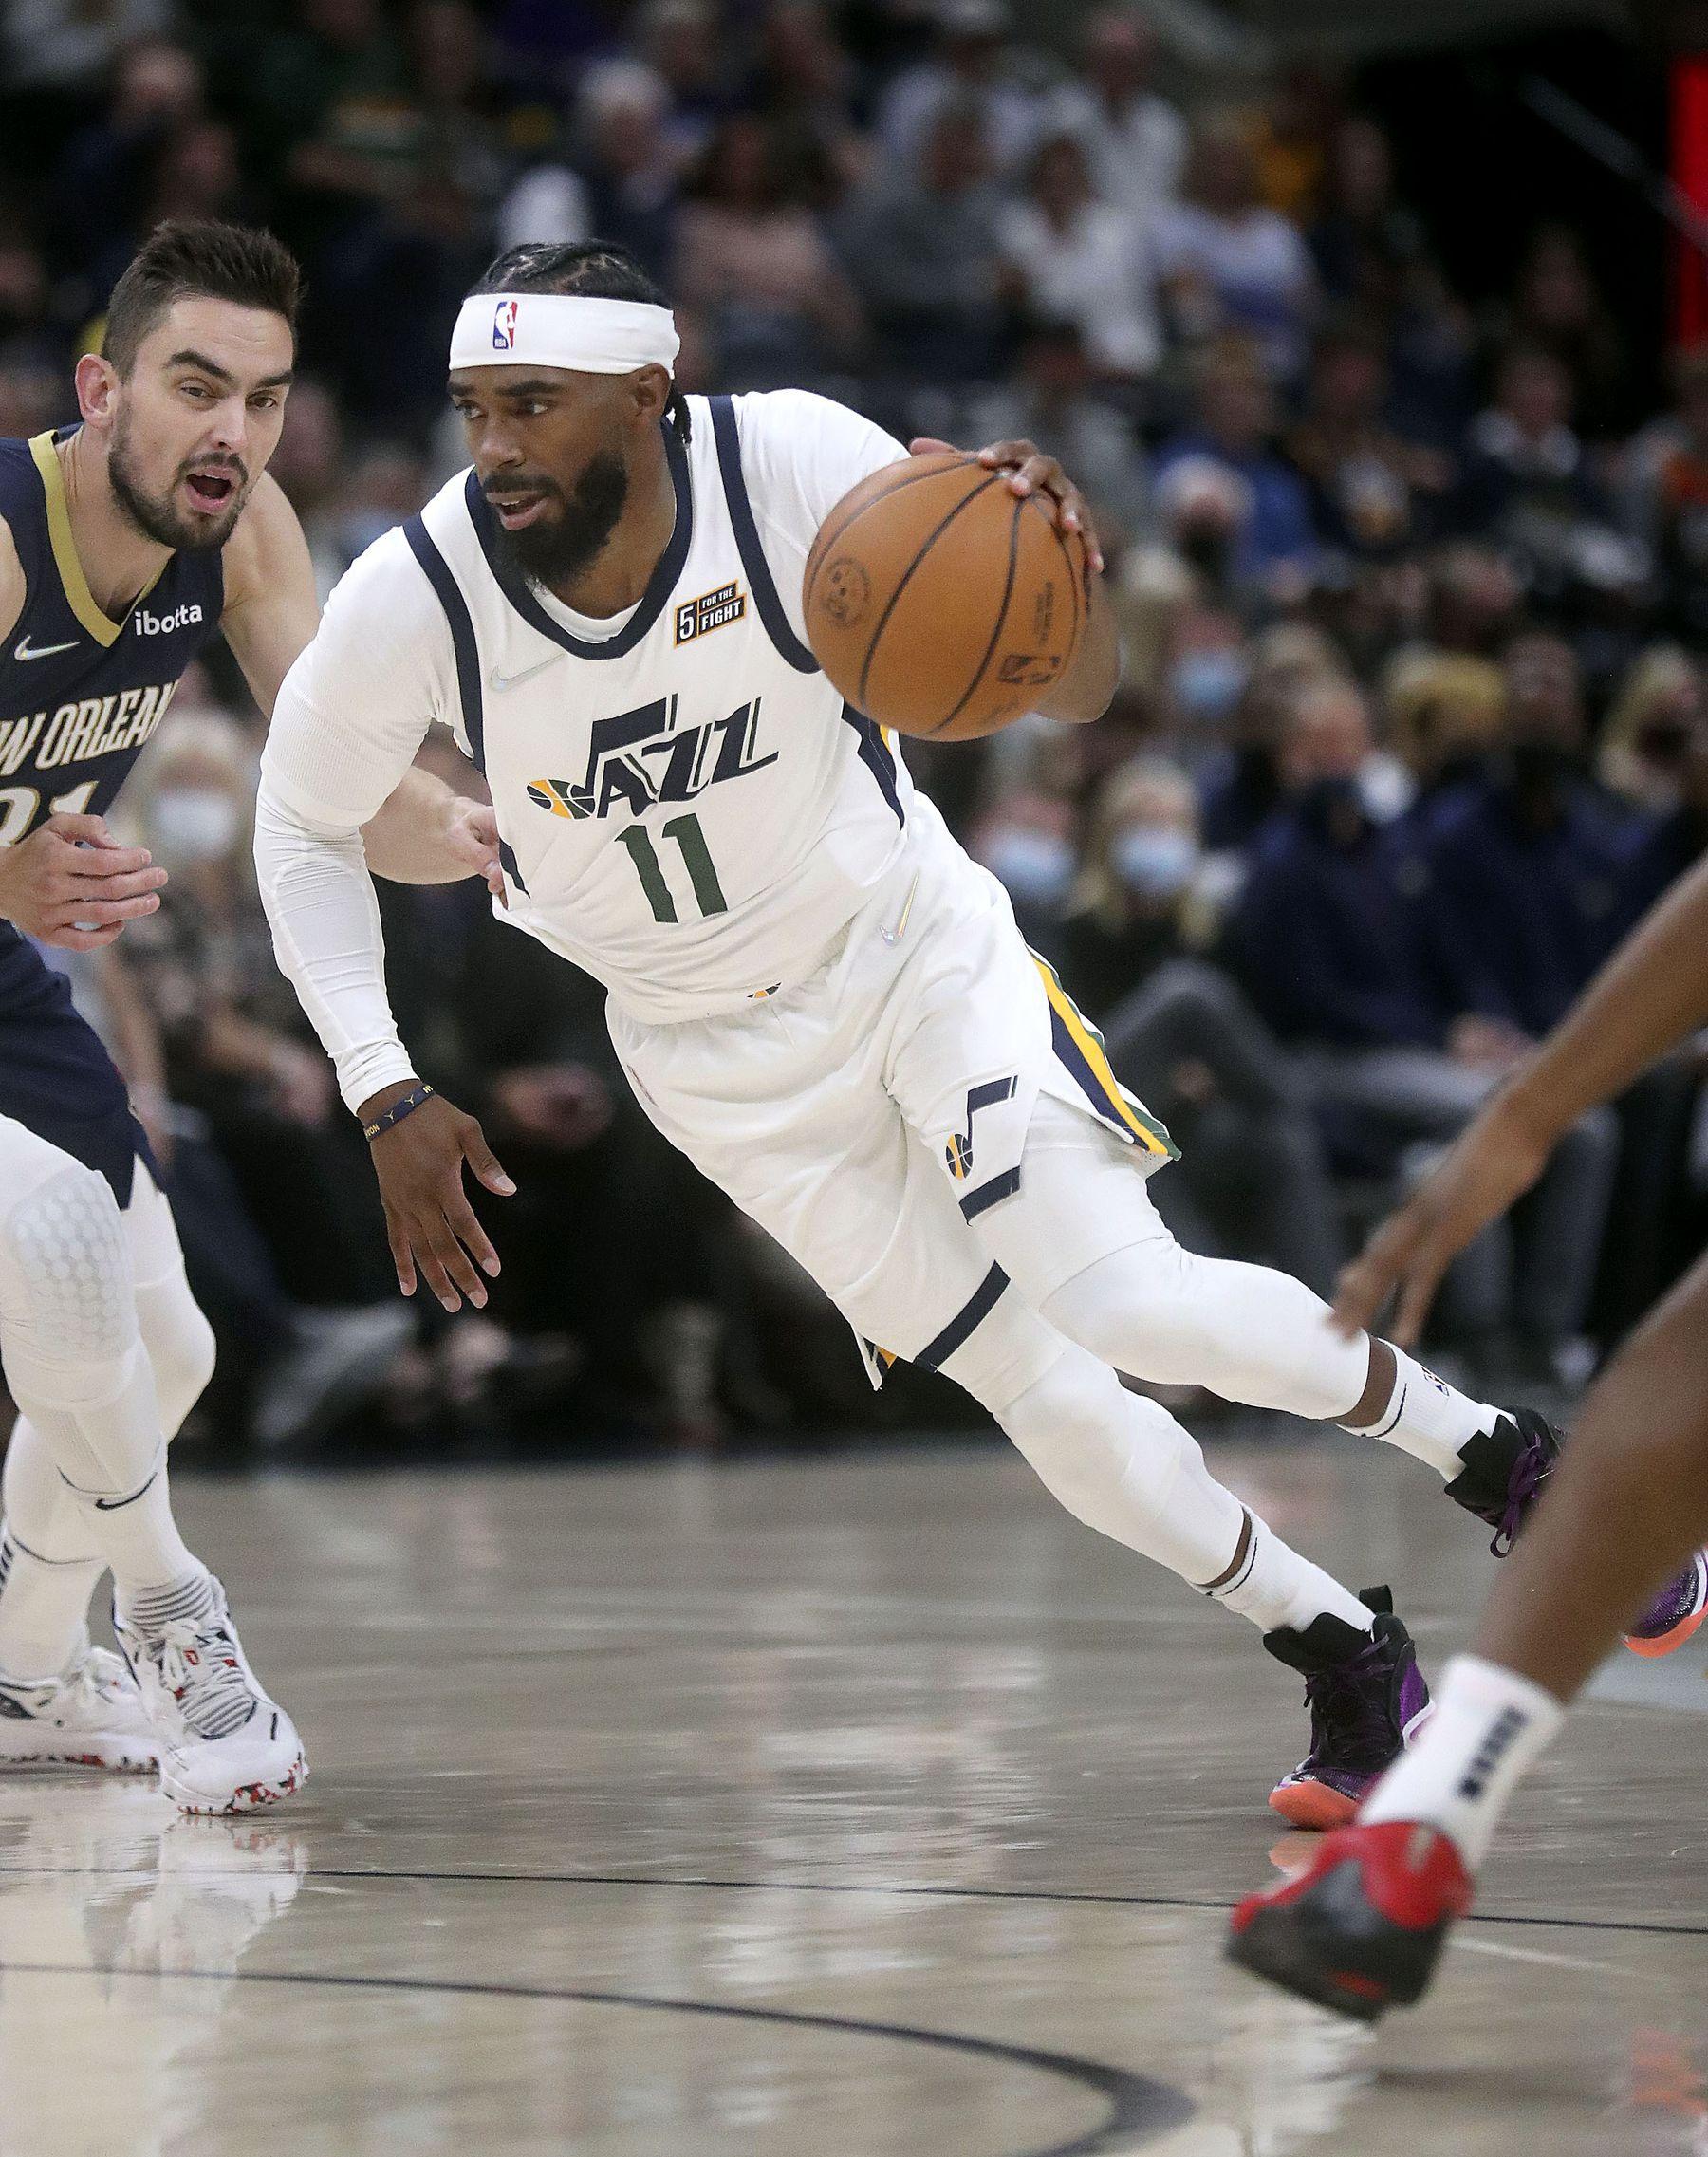 Utah Jazz guard Mike Conley (11) dribbles during a preseason NBA game against the New Orleans Pelicans.